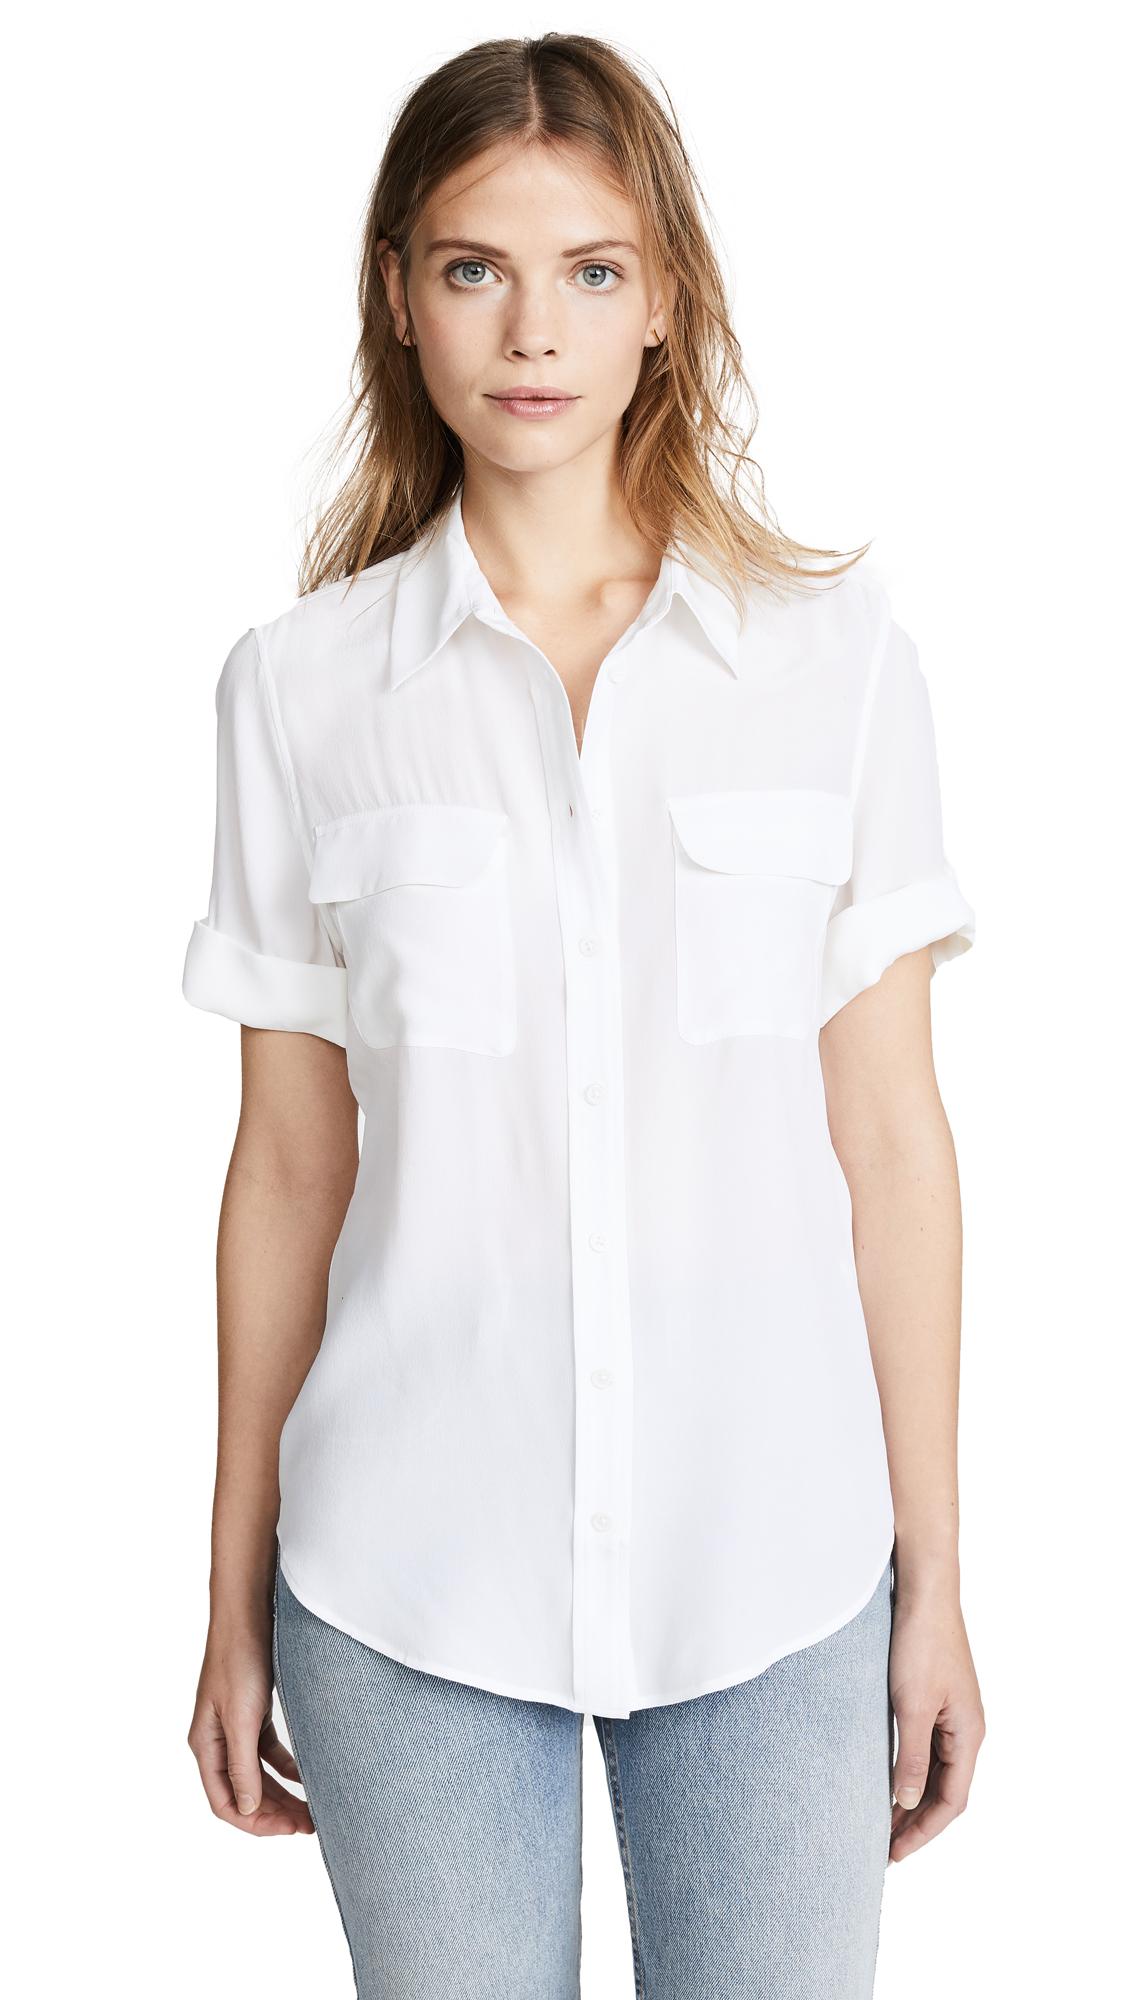 Equipment Short Sleeve Slim Signature Blouse - Bright White